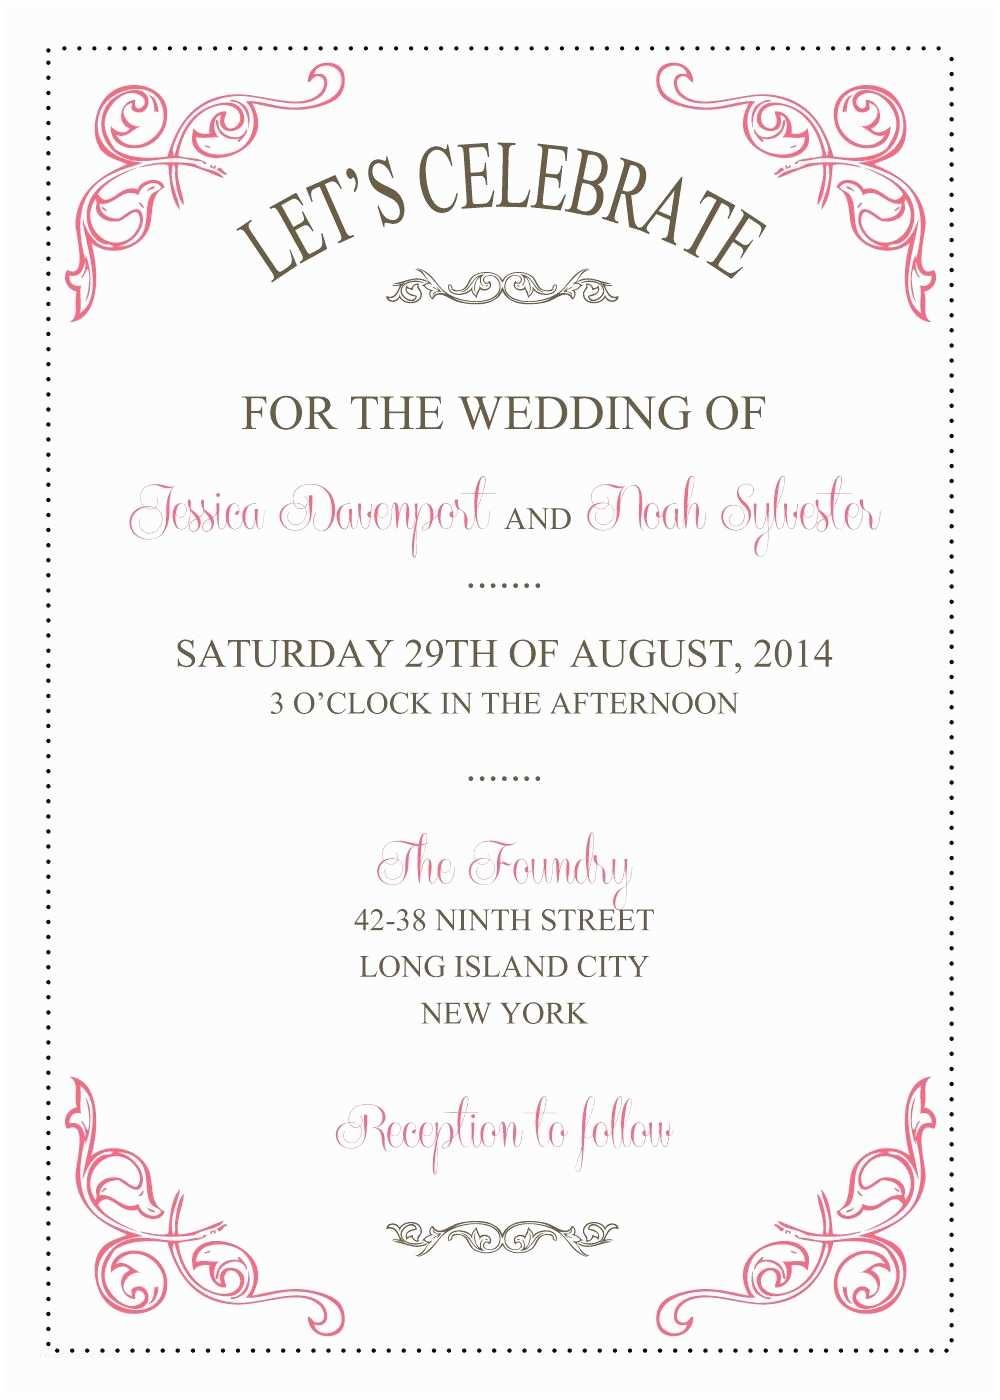 Free Wedding Invitation Samples Wedding Invitations Template Wedding Invitations